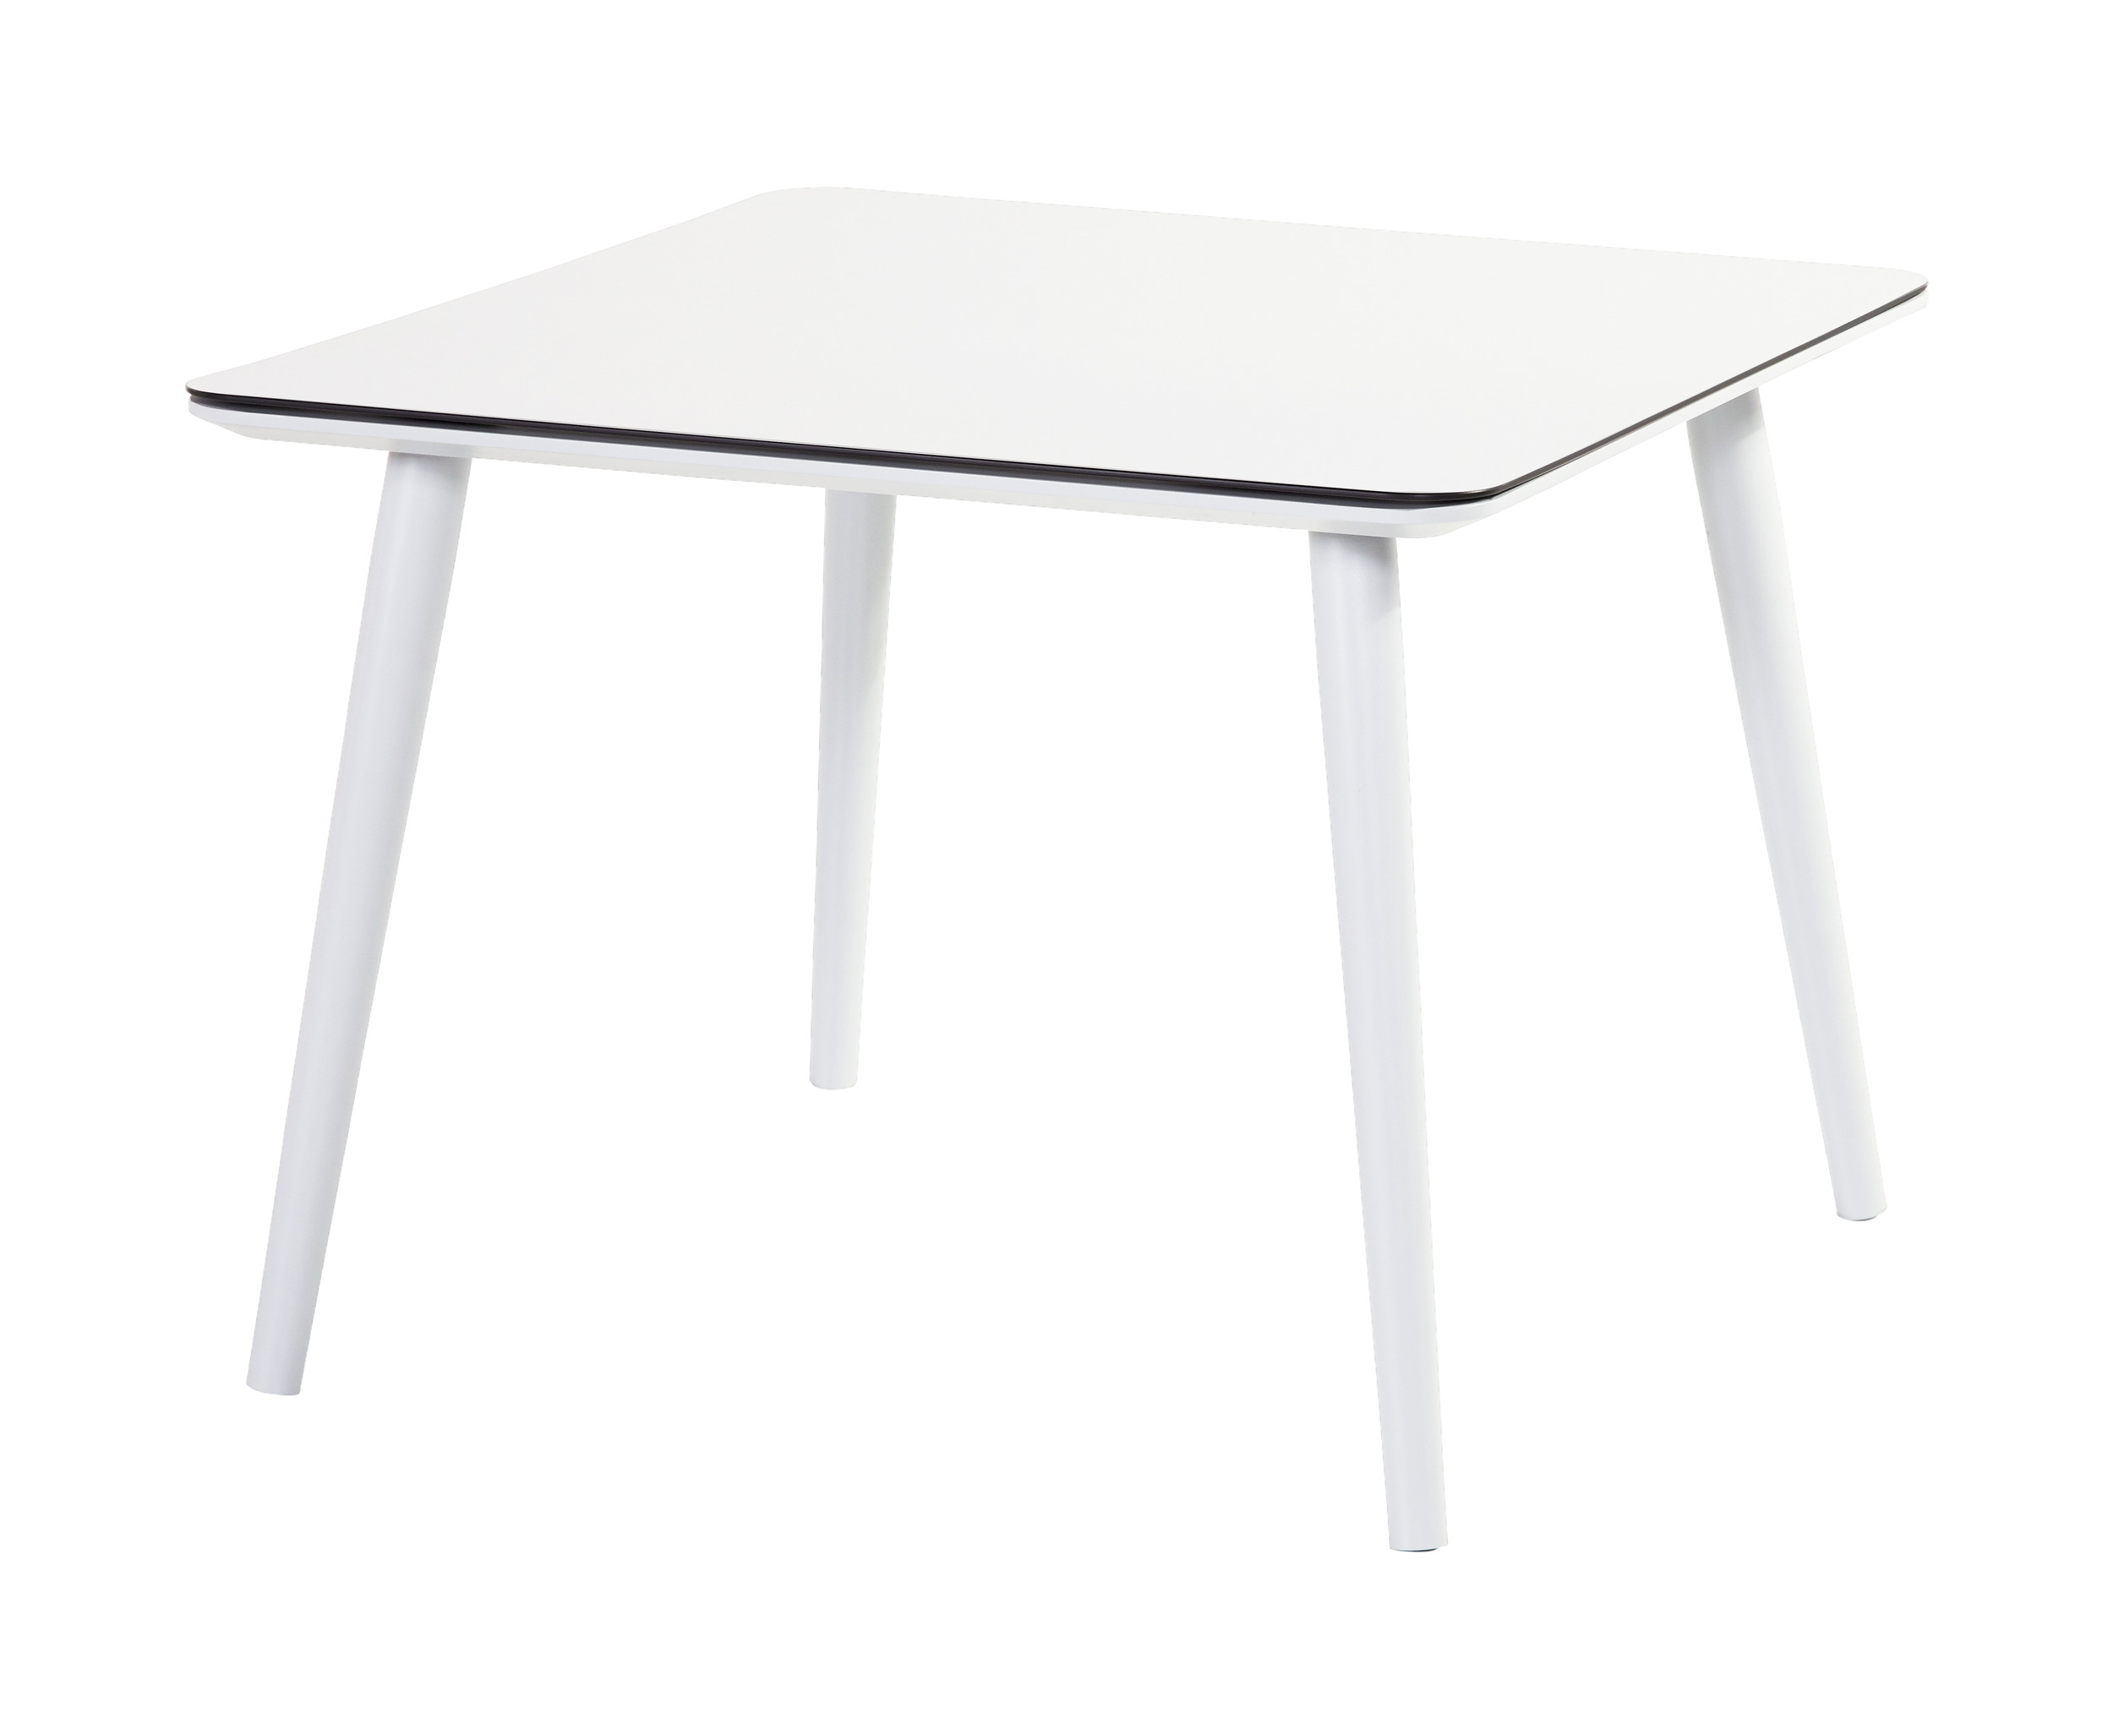 Hartman Tuintafel 'Sophie Studio' HPL, 100 x 100cm, kleur Wit